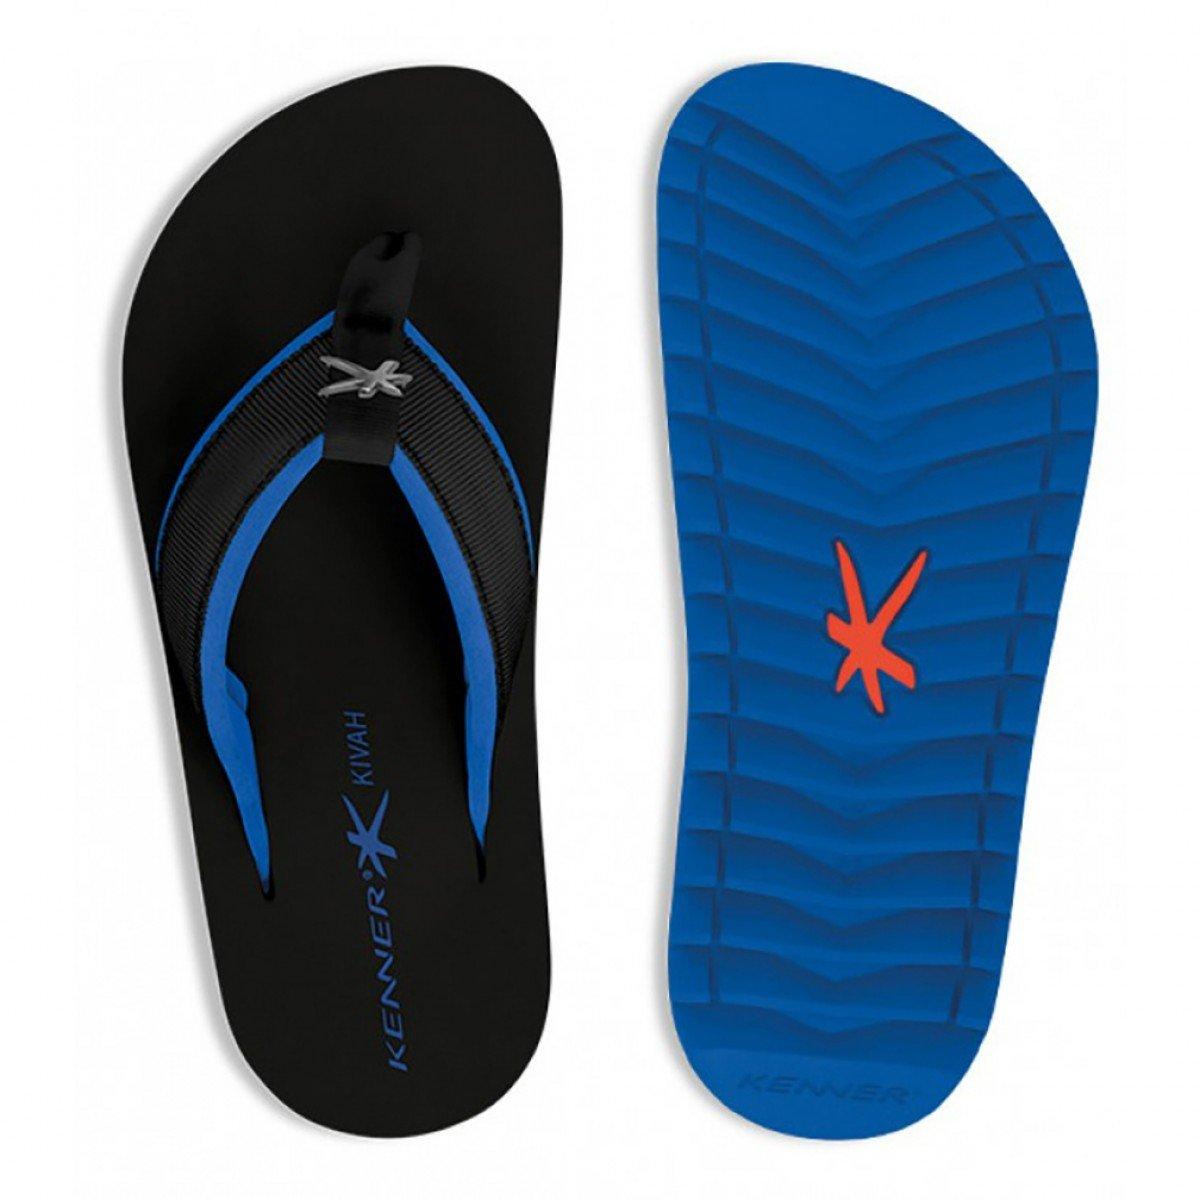 bb25ce803 Sandália Kenner Kivah Cushy TKH 01 Azul - Compre Agora